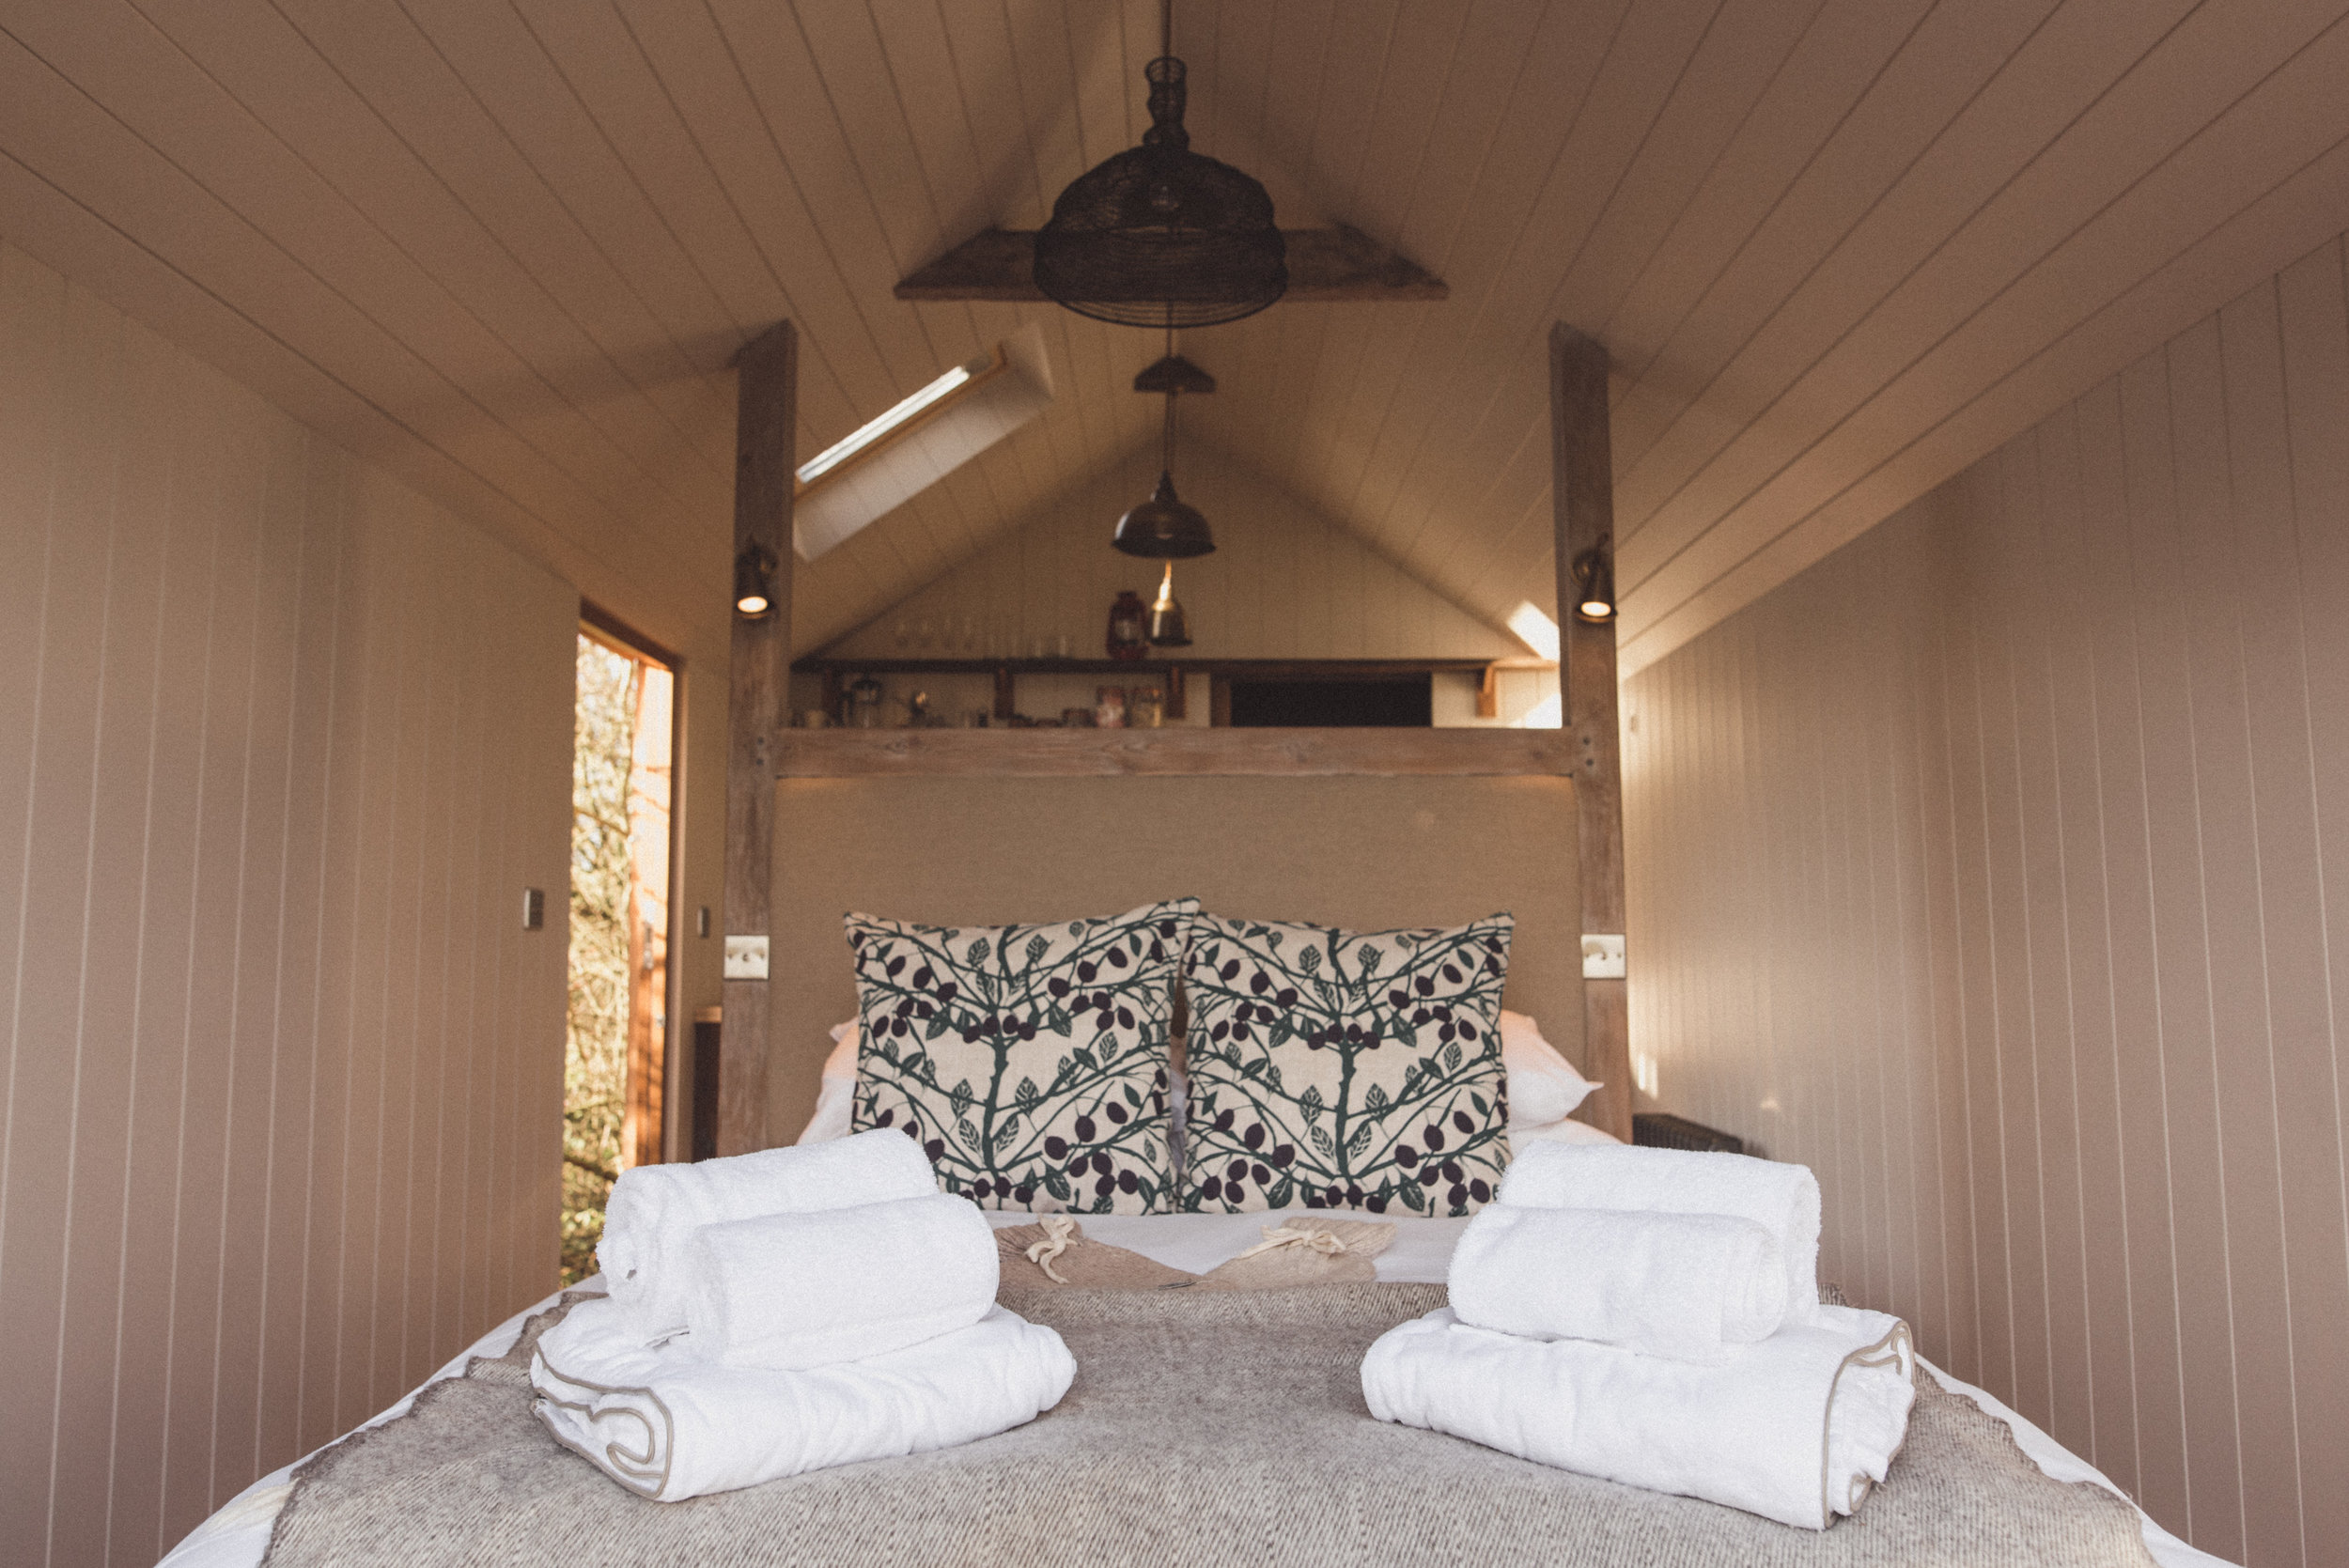 Elmley Damson Shepherd Hut by Rebecca Douglas Photography -213.jpg